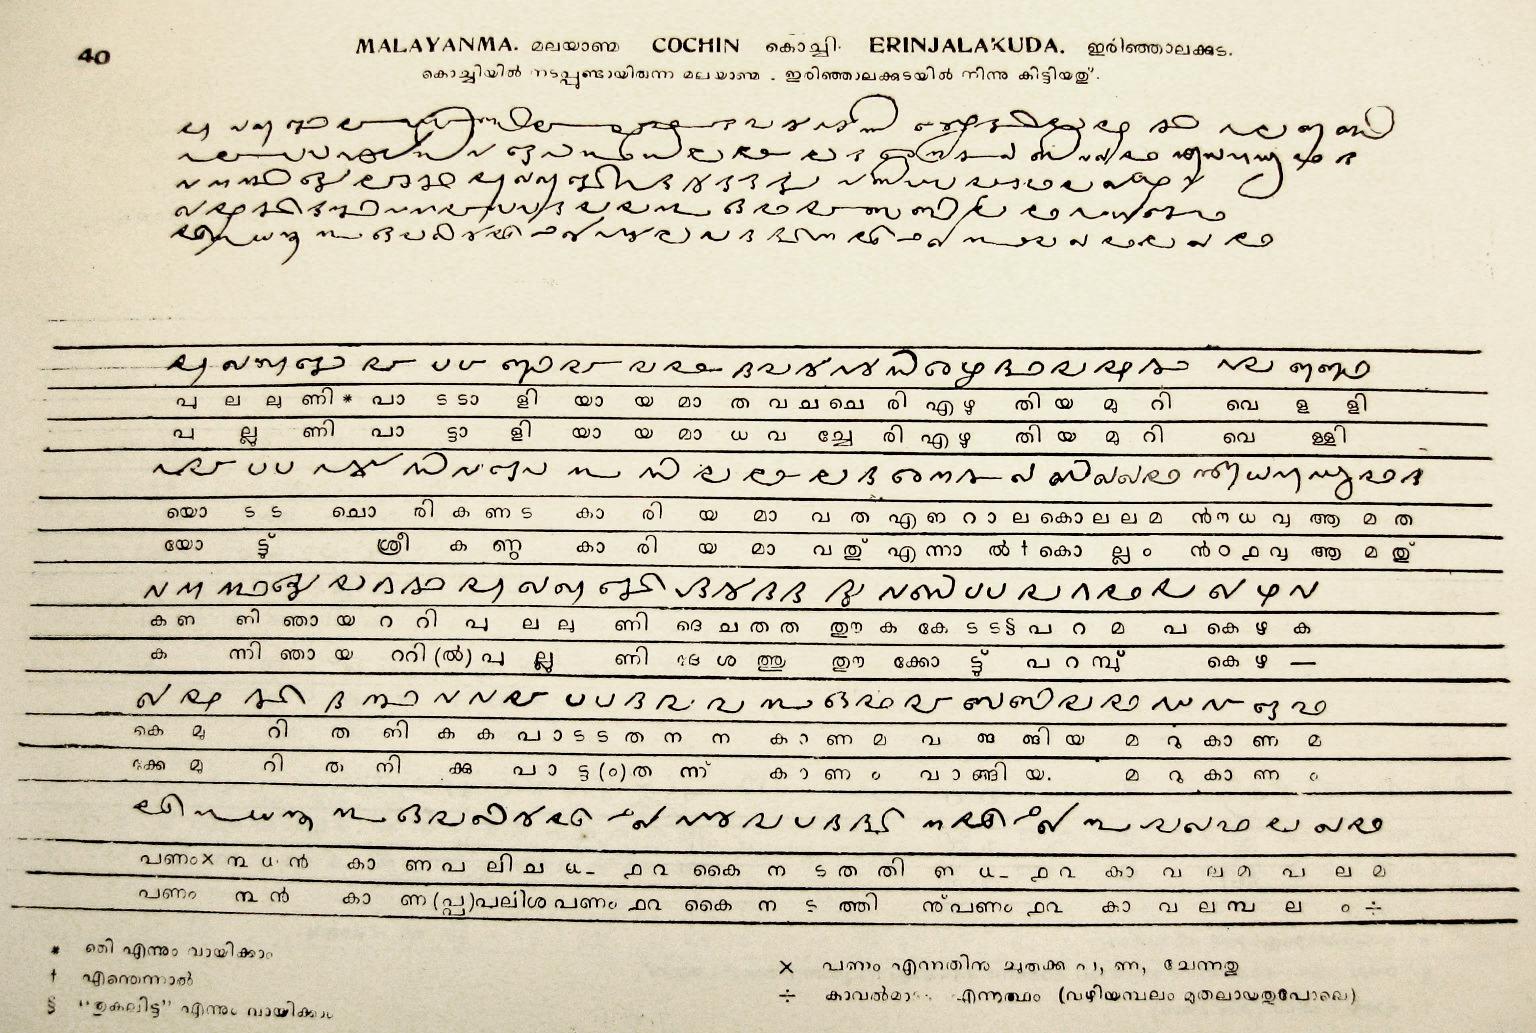 Malayanma Cochin Erinjalkuda script